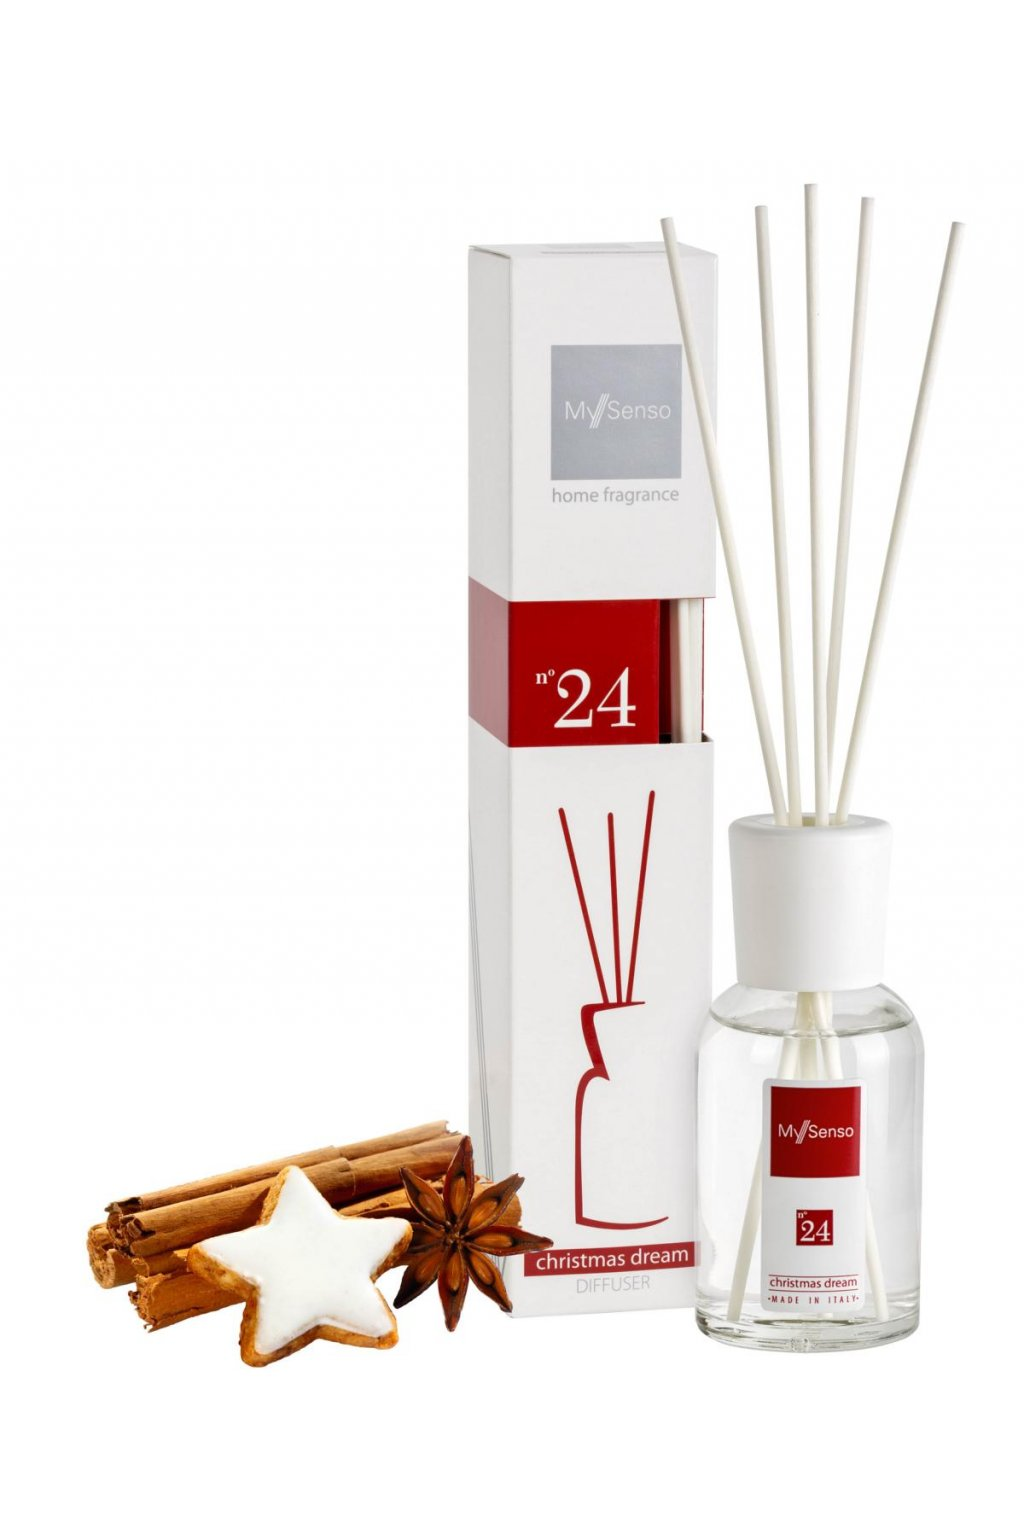 99 my senso aromaticky difuzer midi 100ml n 24 christmas dream vanocni sen